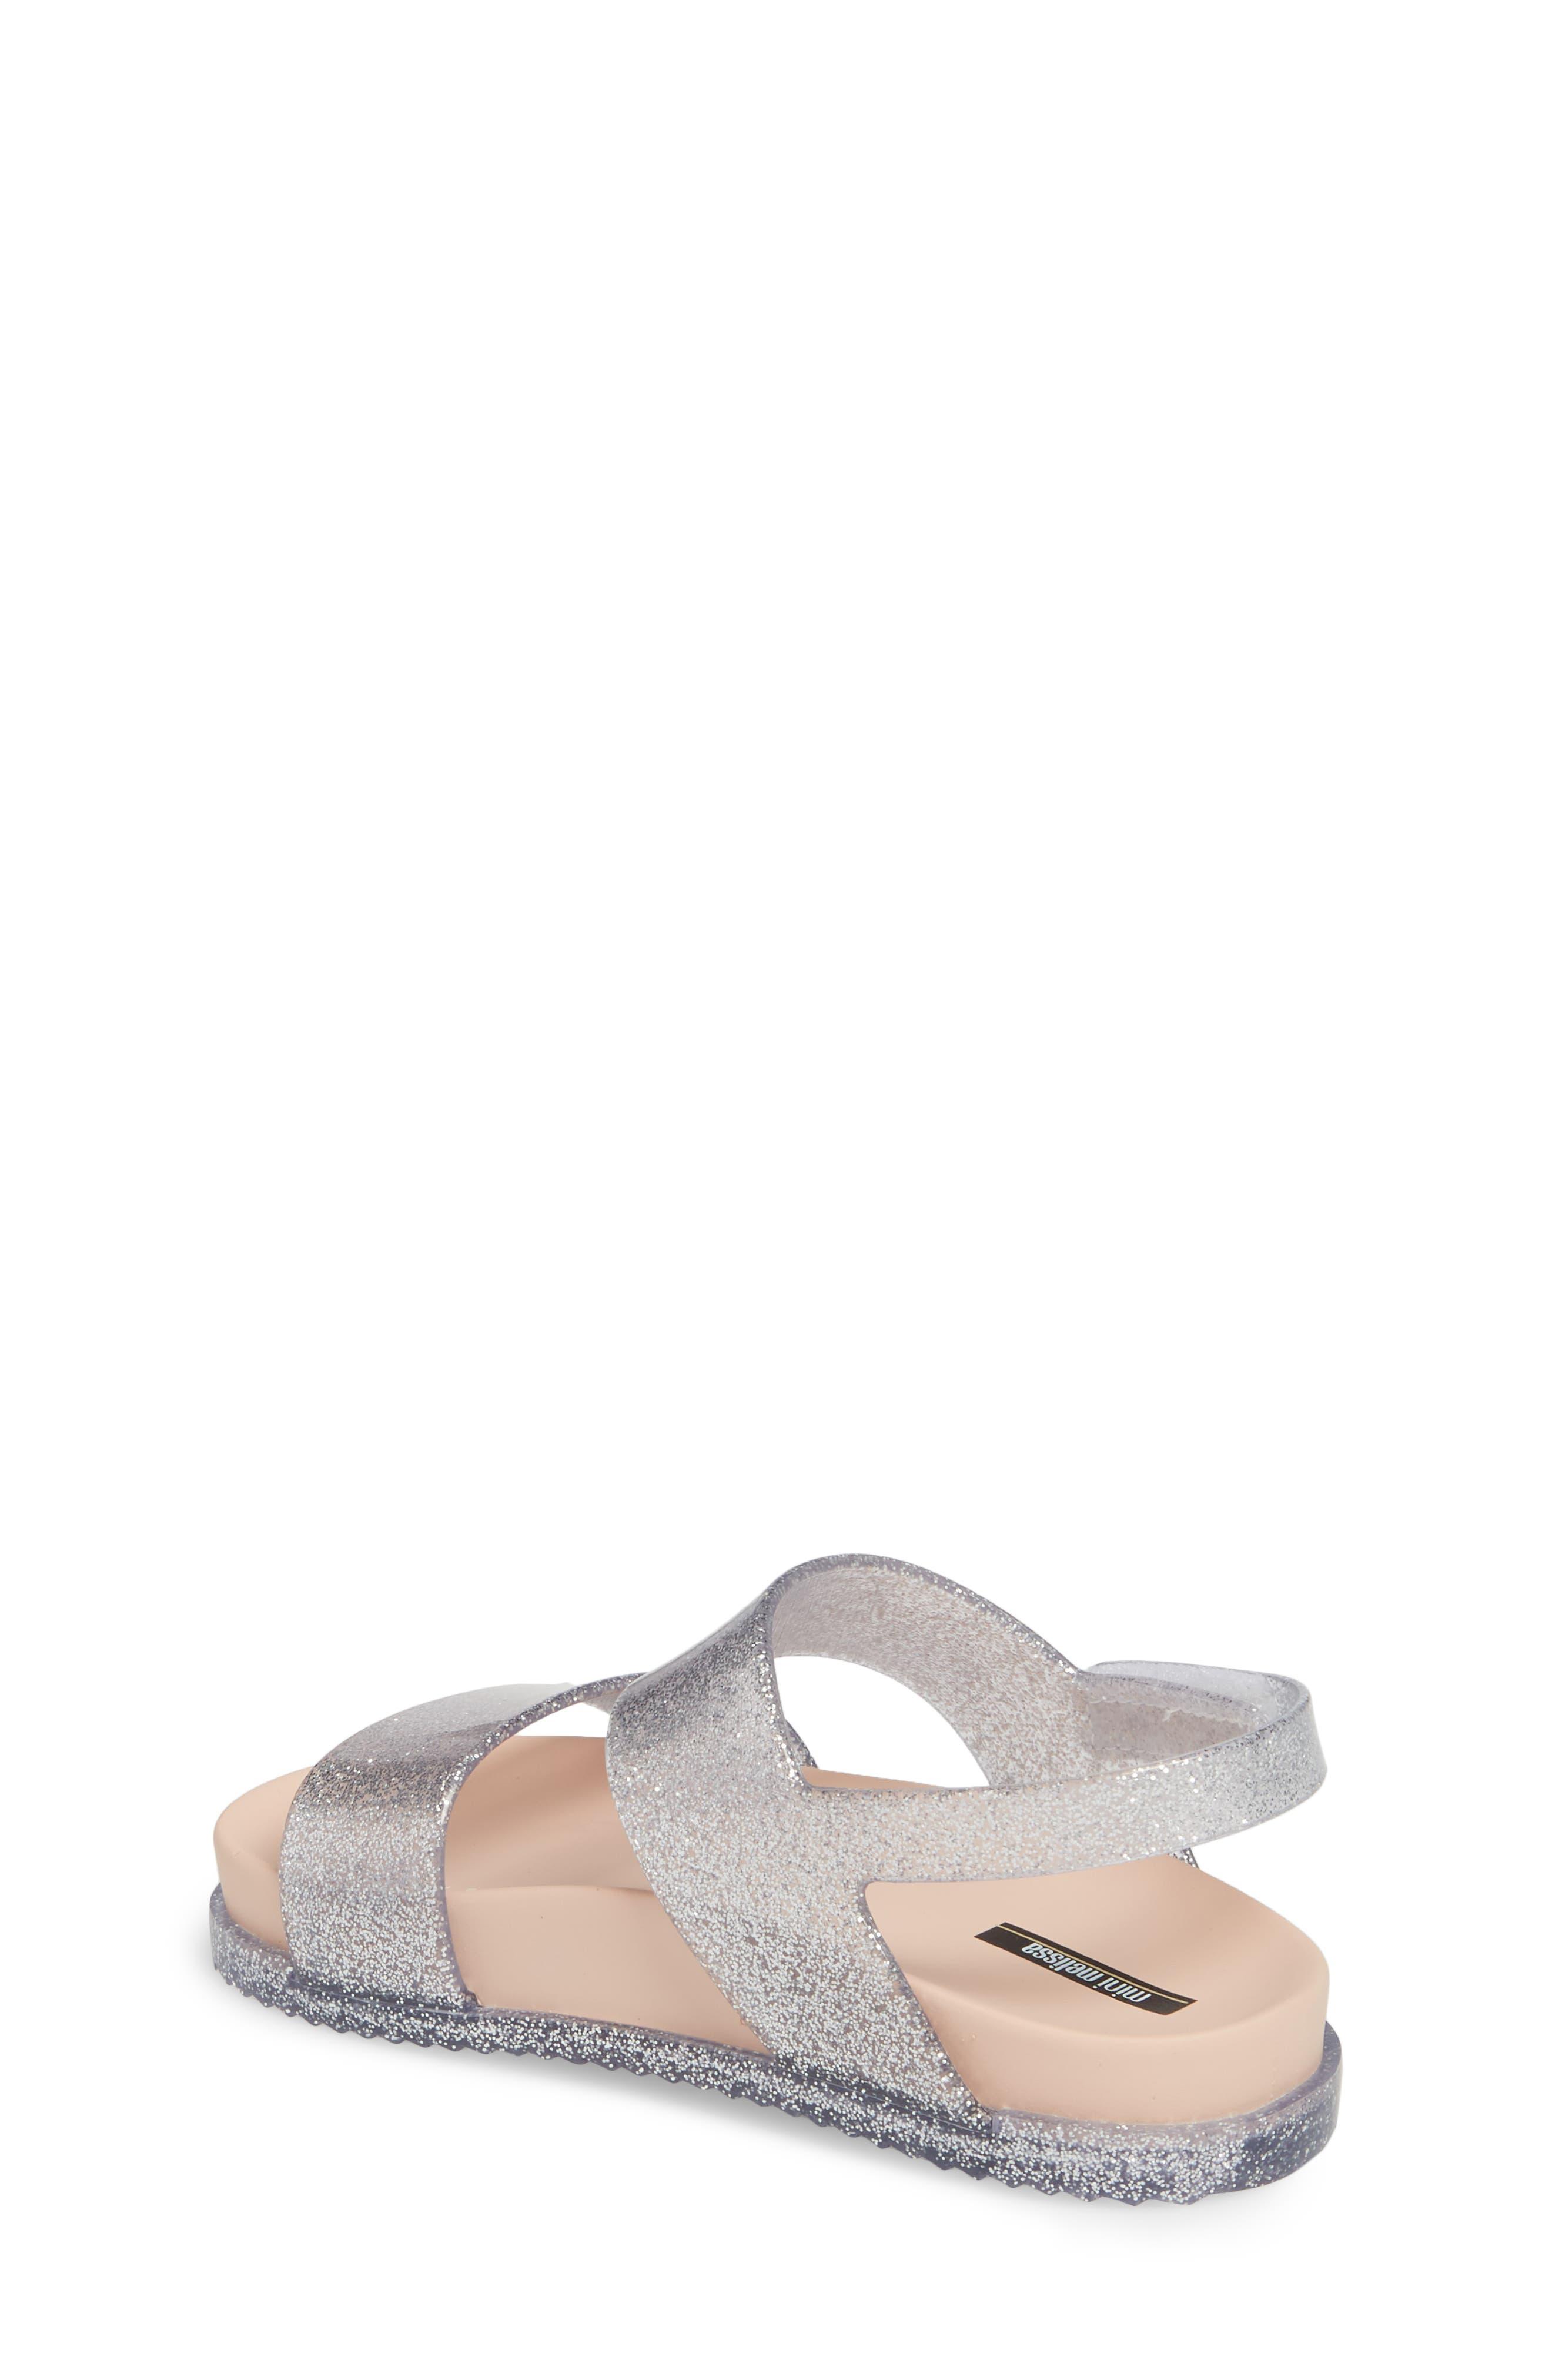 Glittery Cosmic Sandal,                             Alternate thumbnail 2, color,                             Pink Silver Sparkle